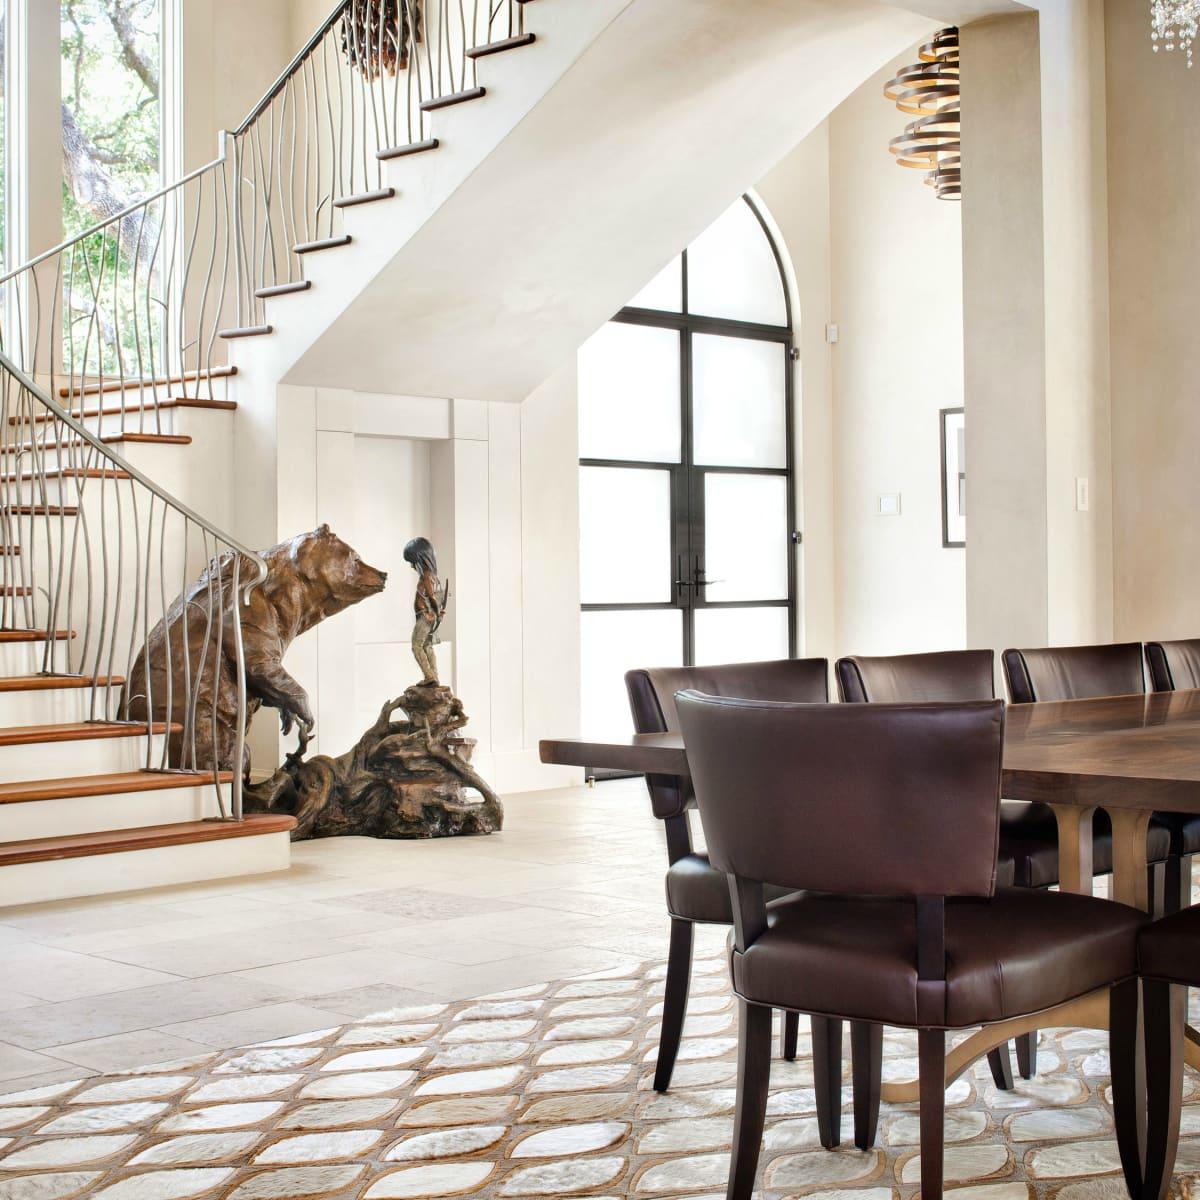 Austin house home 101 Pascal Lane Weslake Rob Roy neighborhood stairs